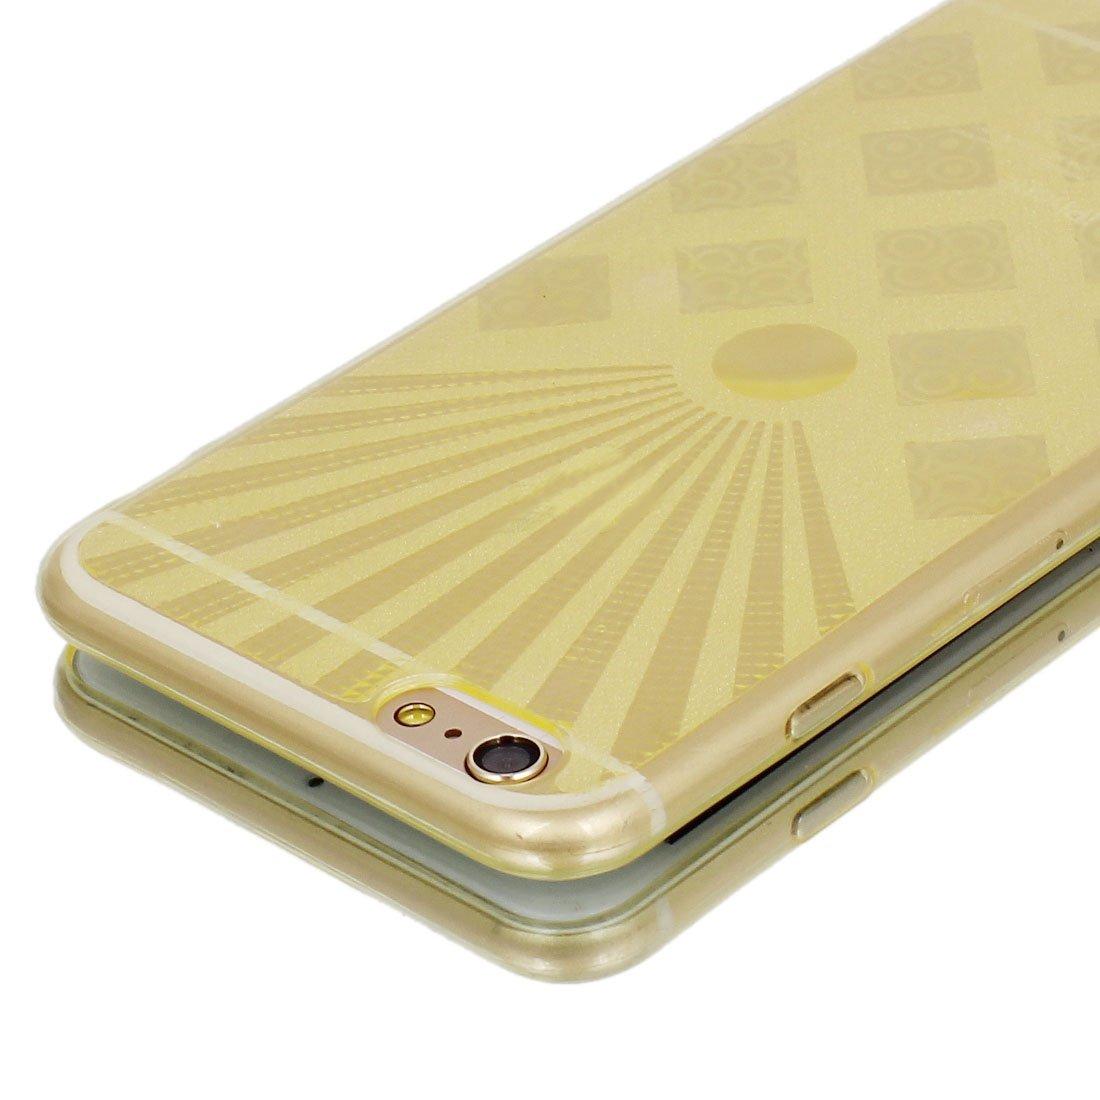 Amazon.com: eDealMax Caso cubierta trasera w película protectora de limpiaparabrisas Para Apple iPhone 6 Plus: Electronics